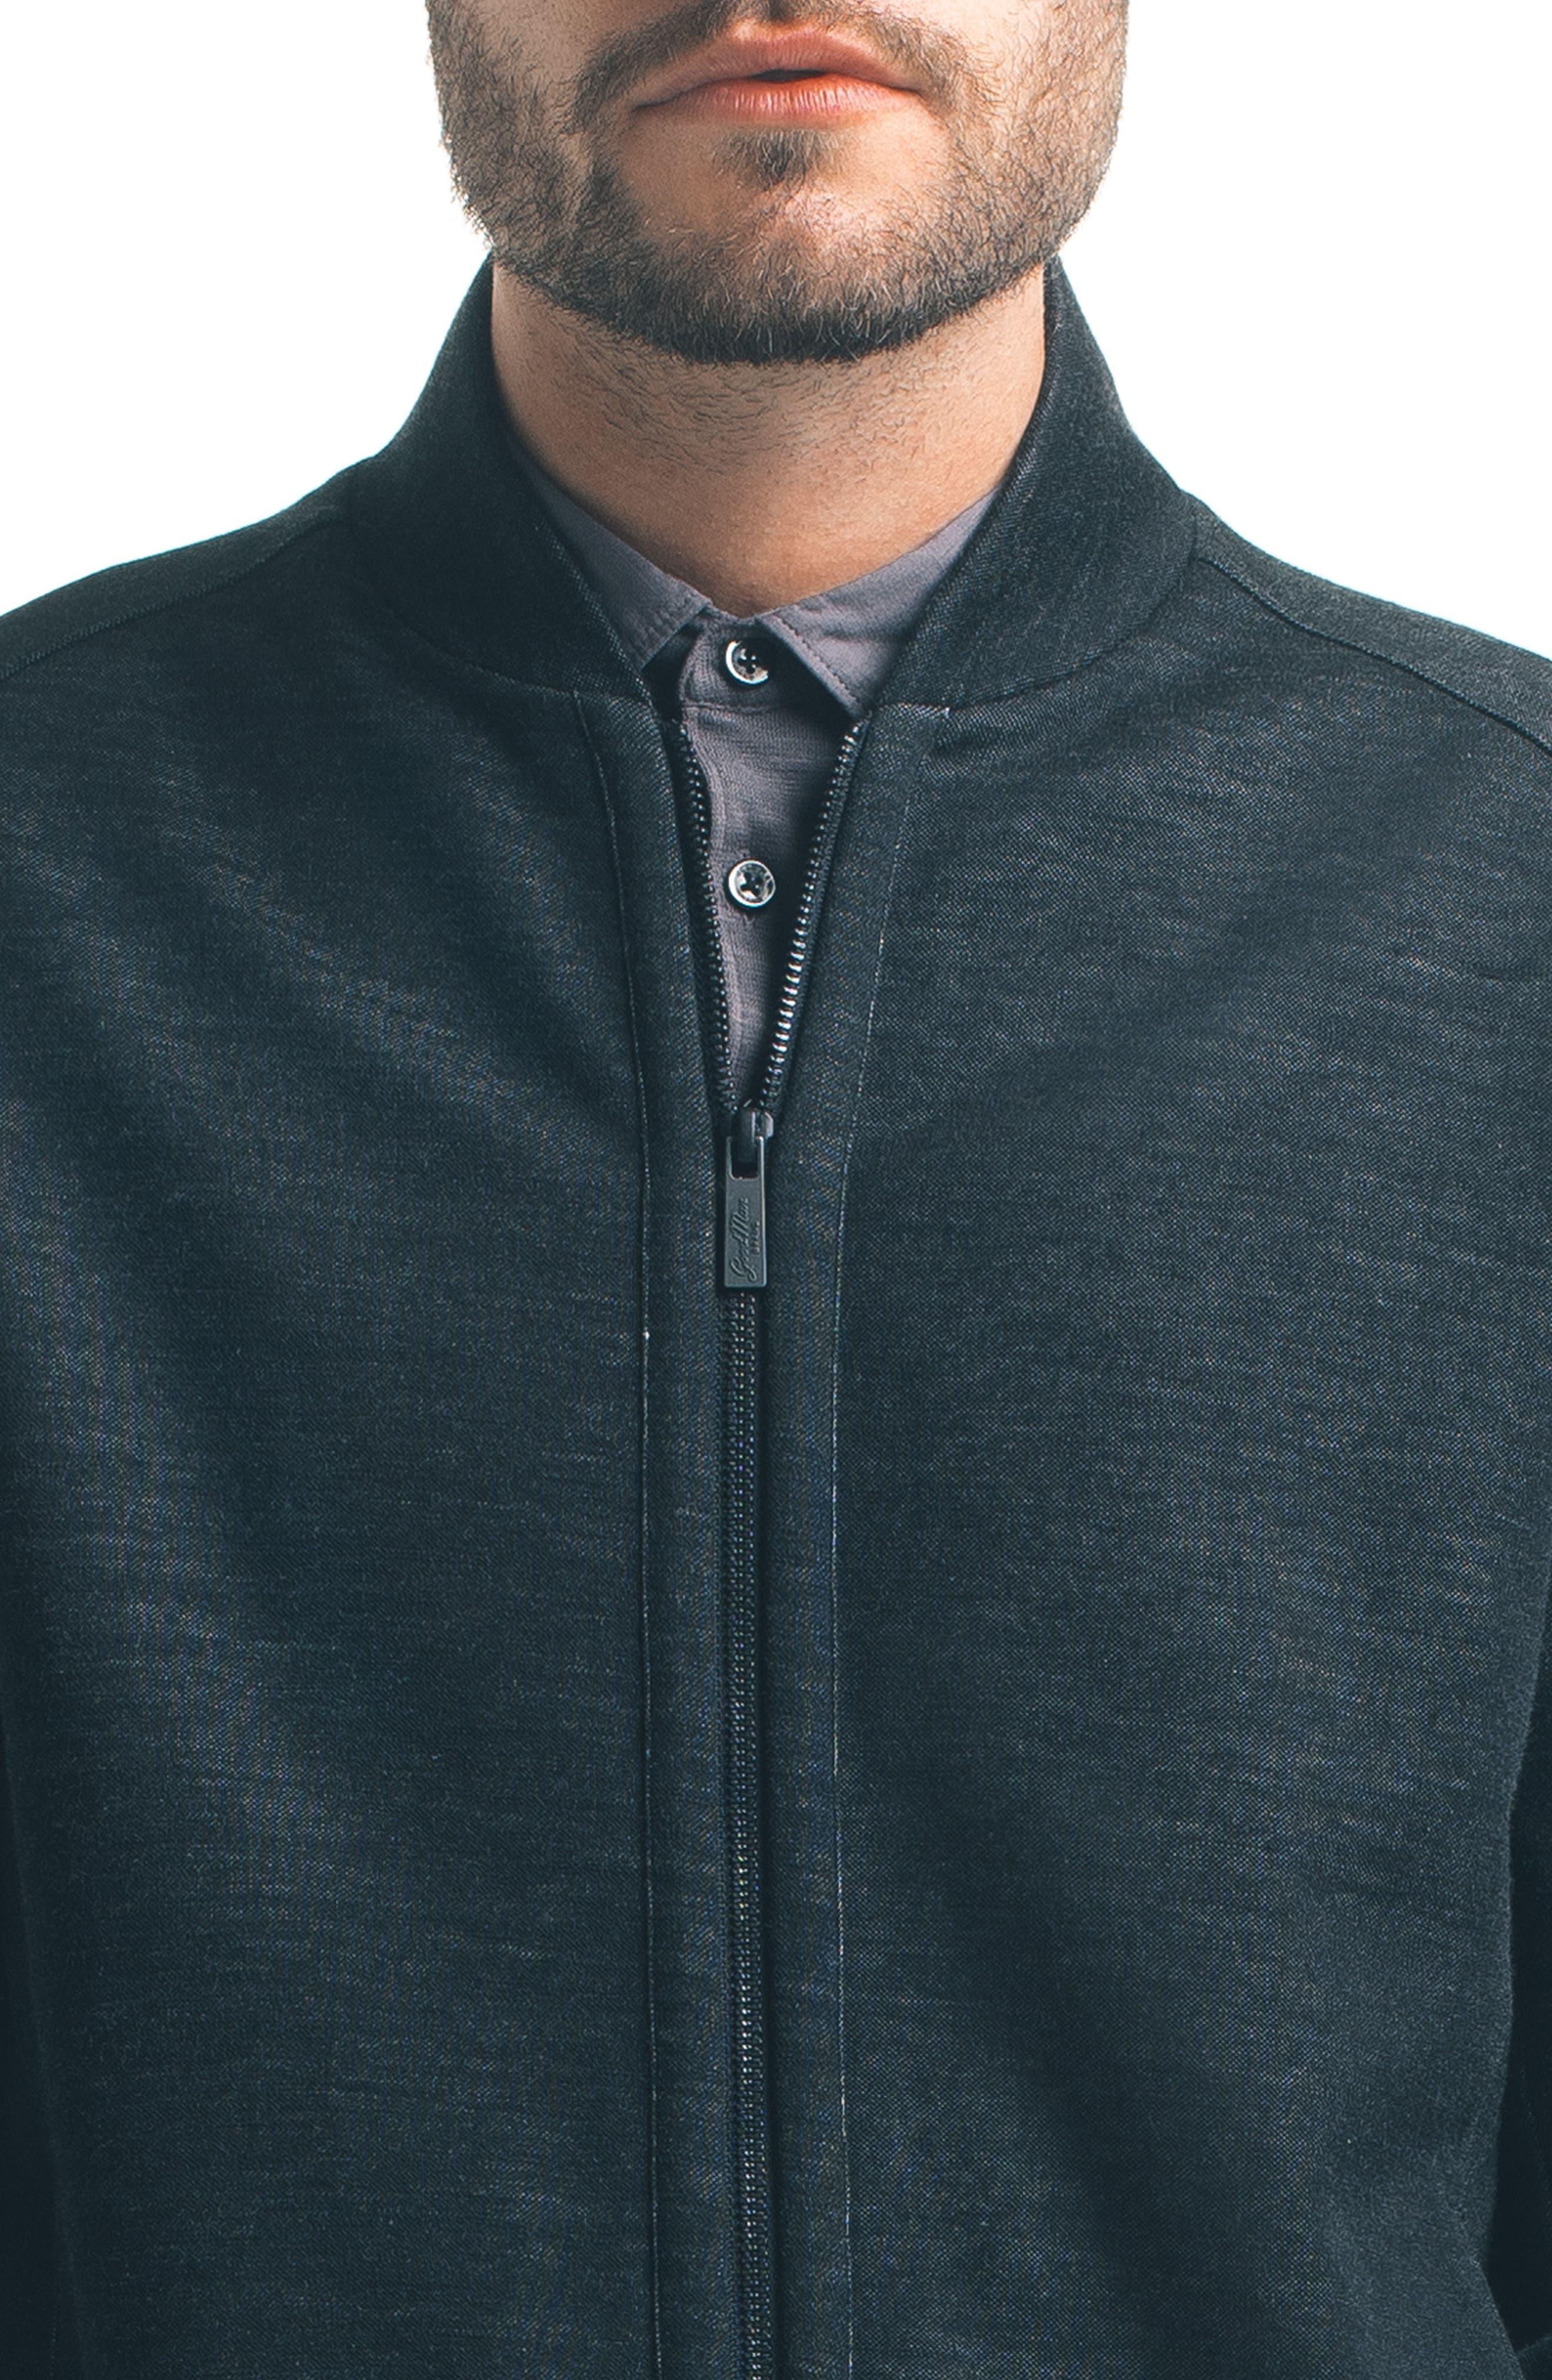 Modern Slim Fit Bomber Jacket,                             Alternate thumbnail 4, color,                             Black